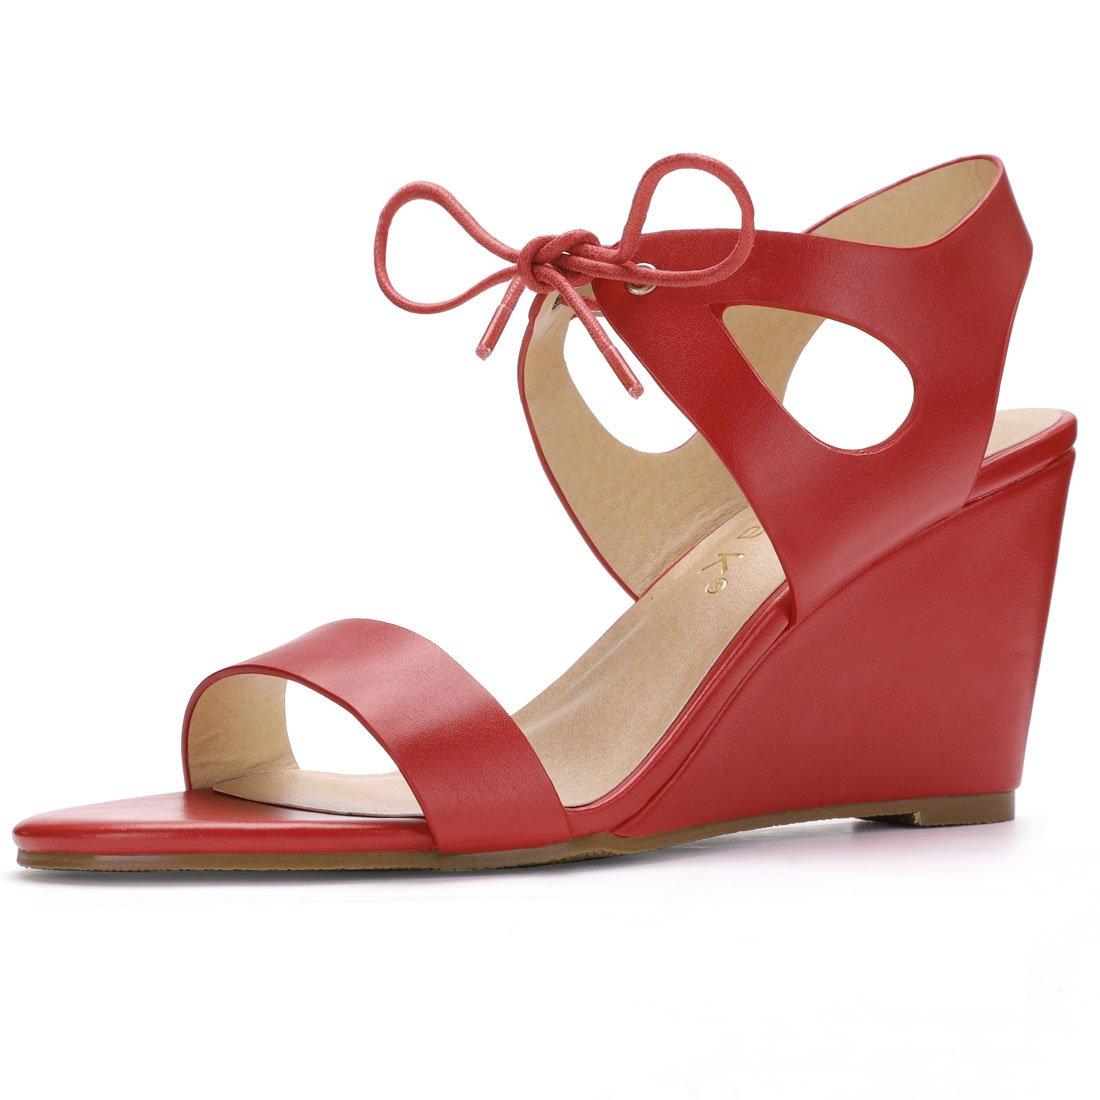 Allegra K Women's Cutout Tie-up Wedge Sandals B073QP85FV 5.5 M US|Red